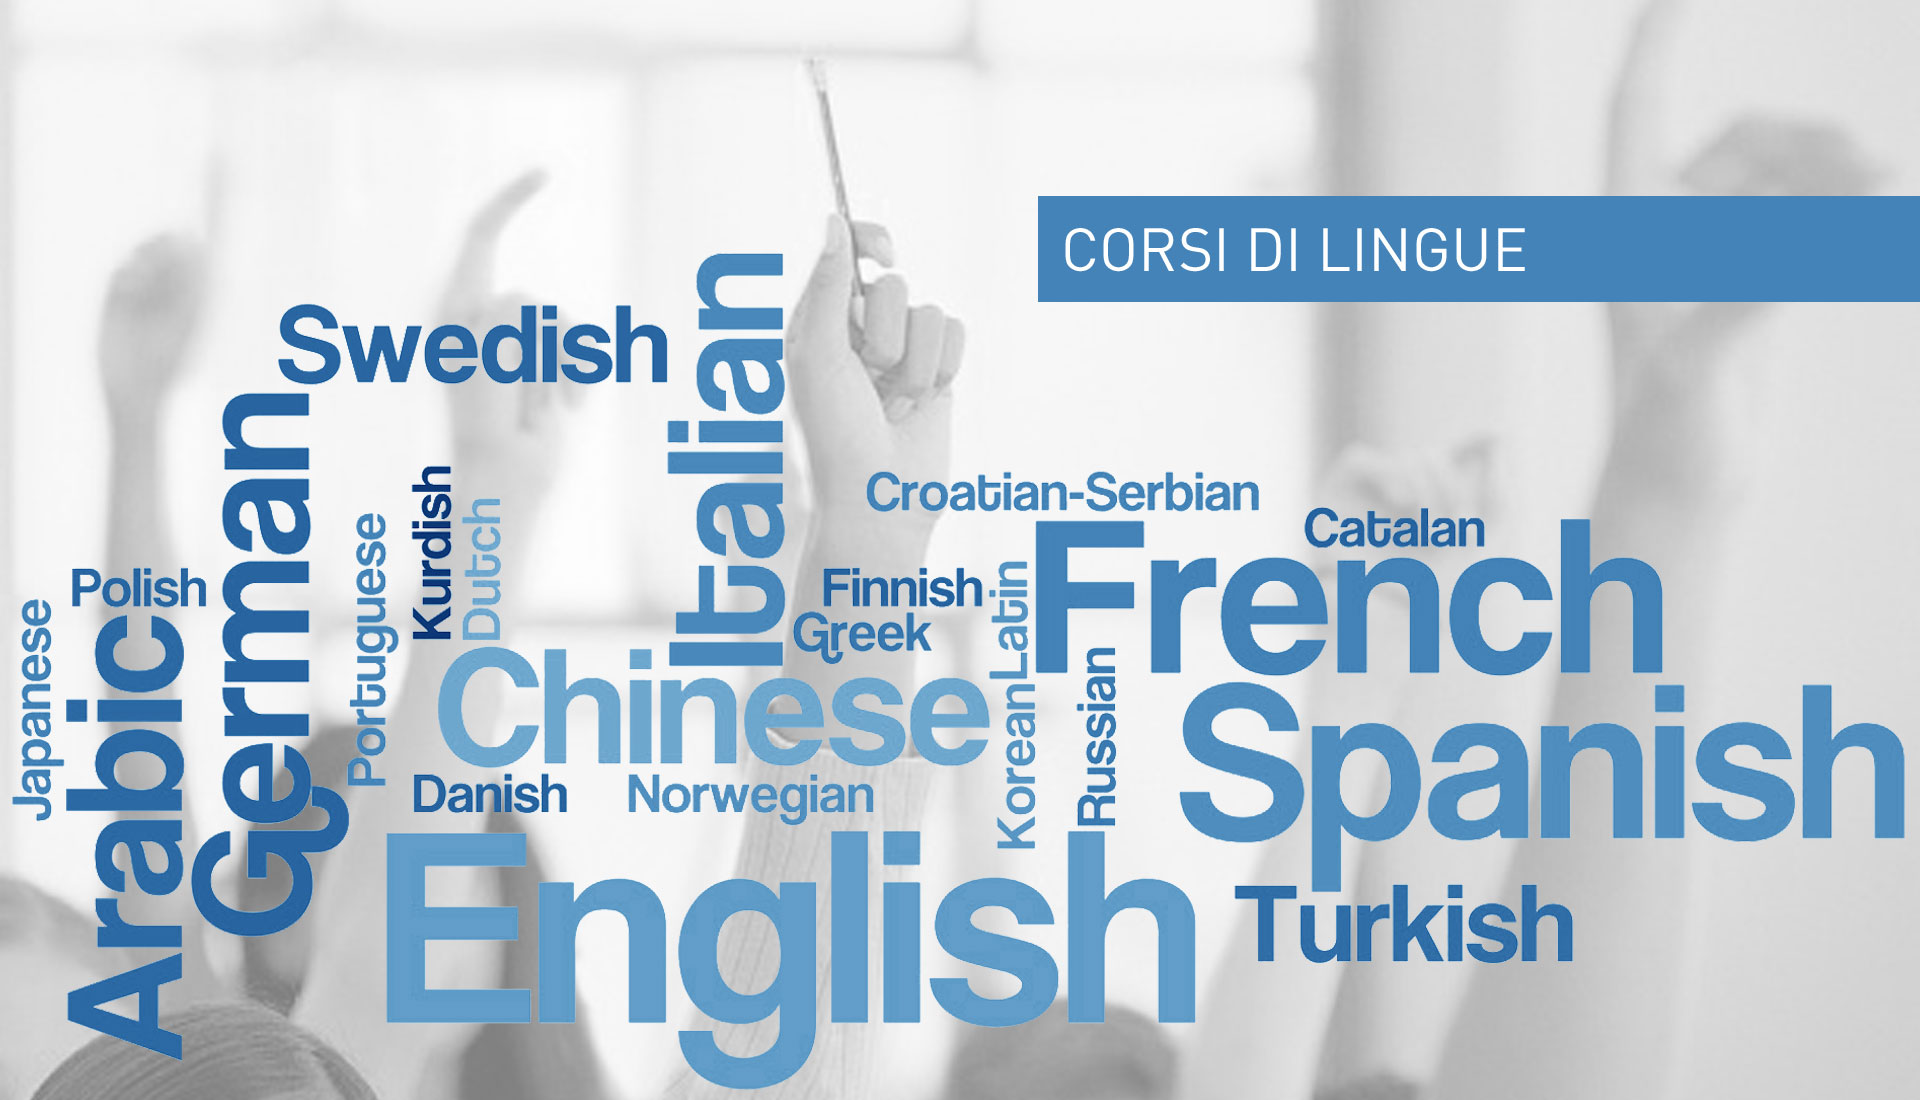 serid-corsi-di-lingue